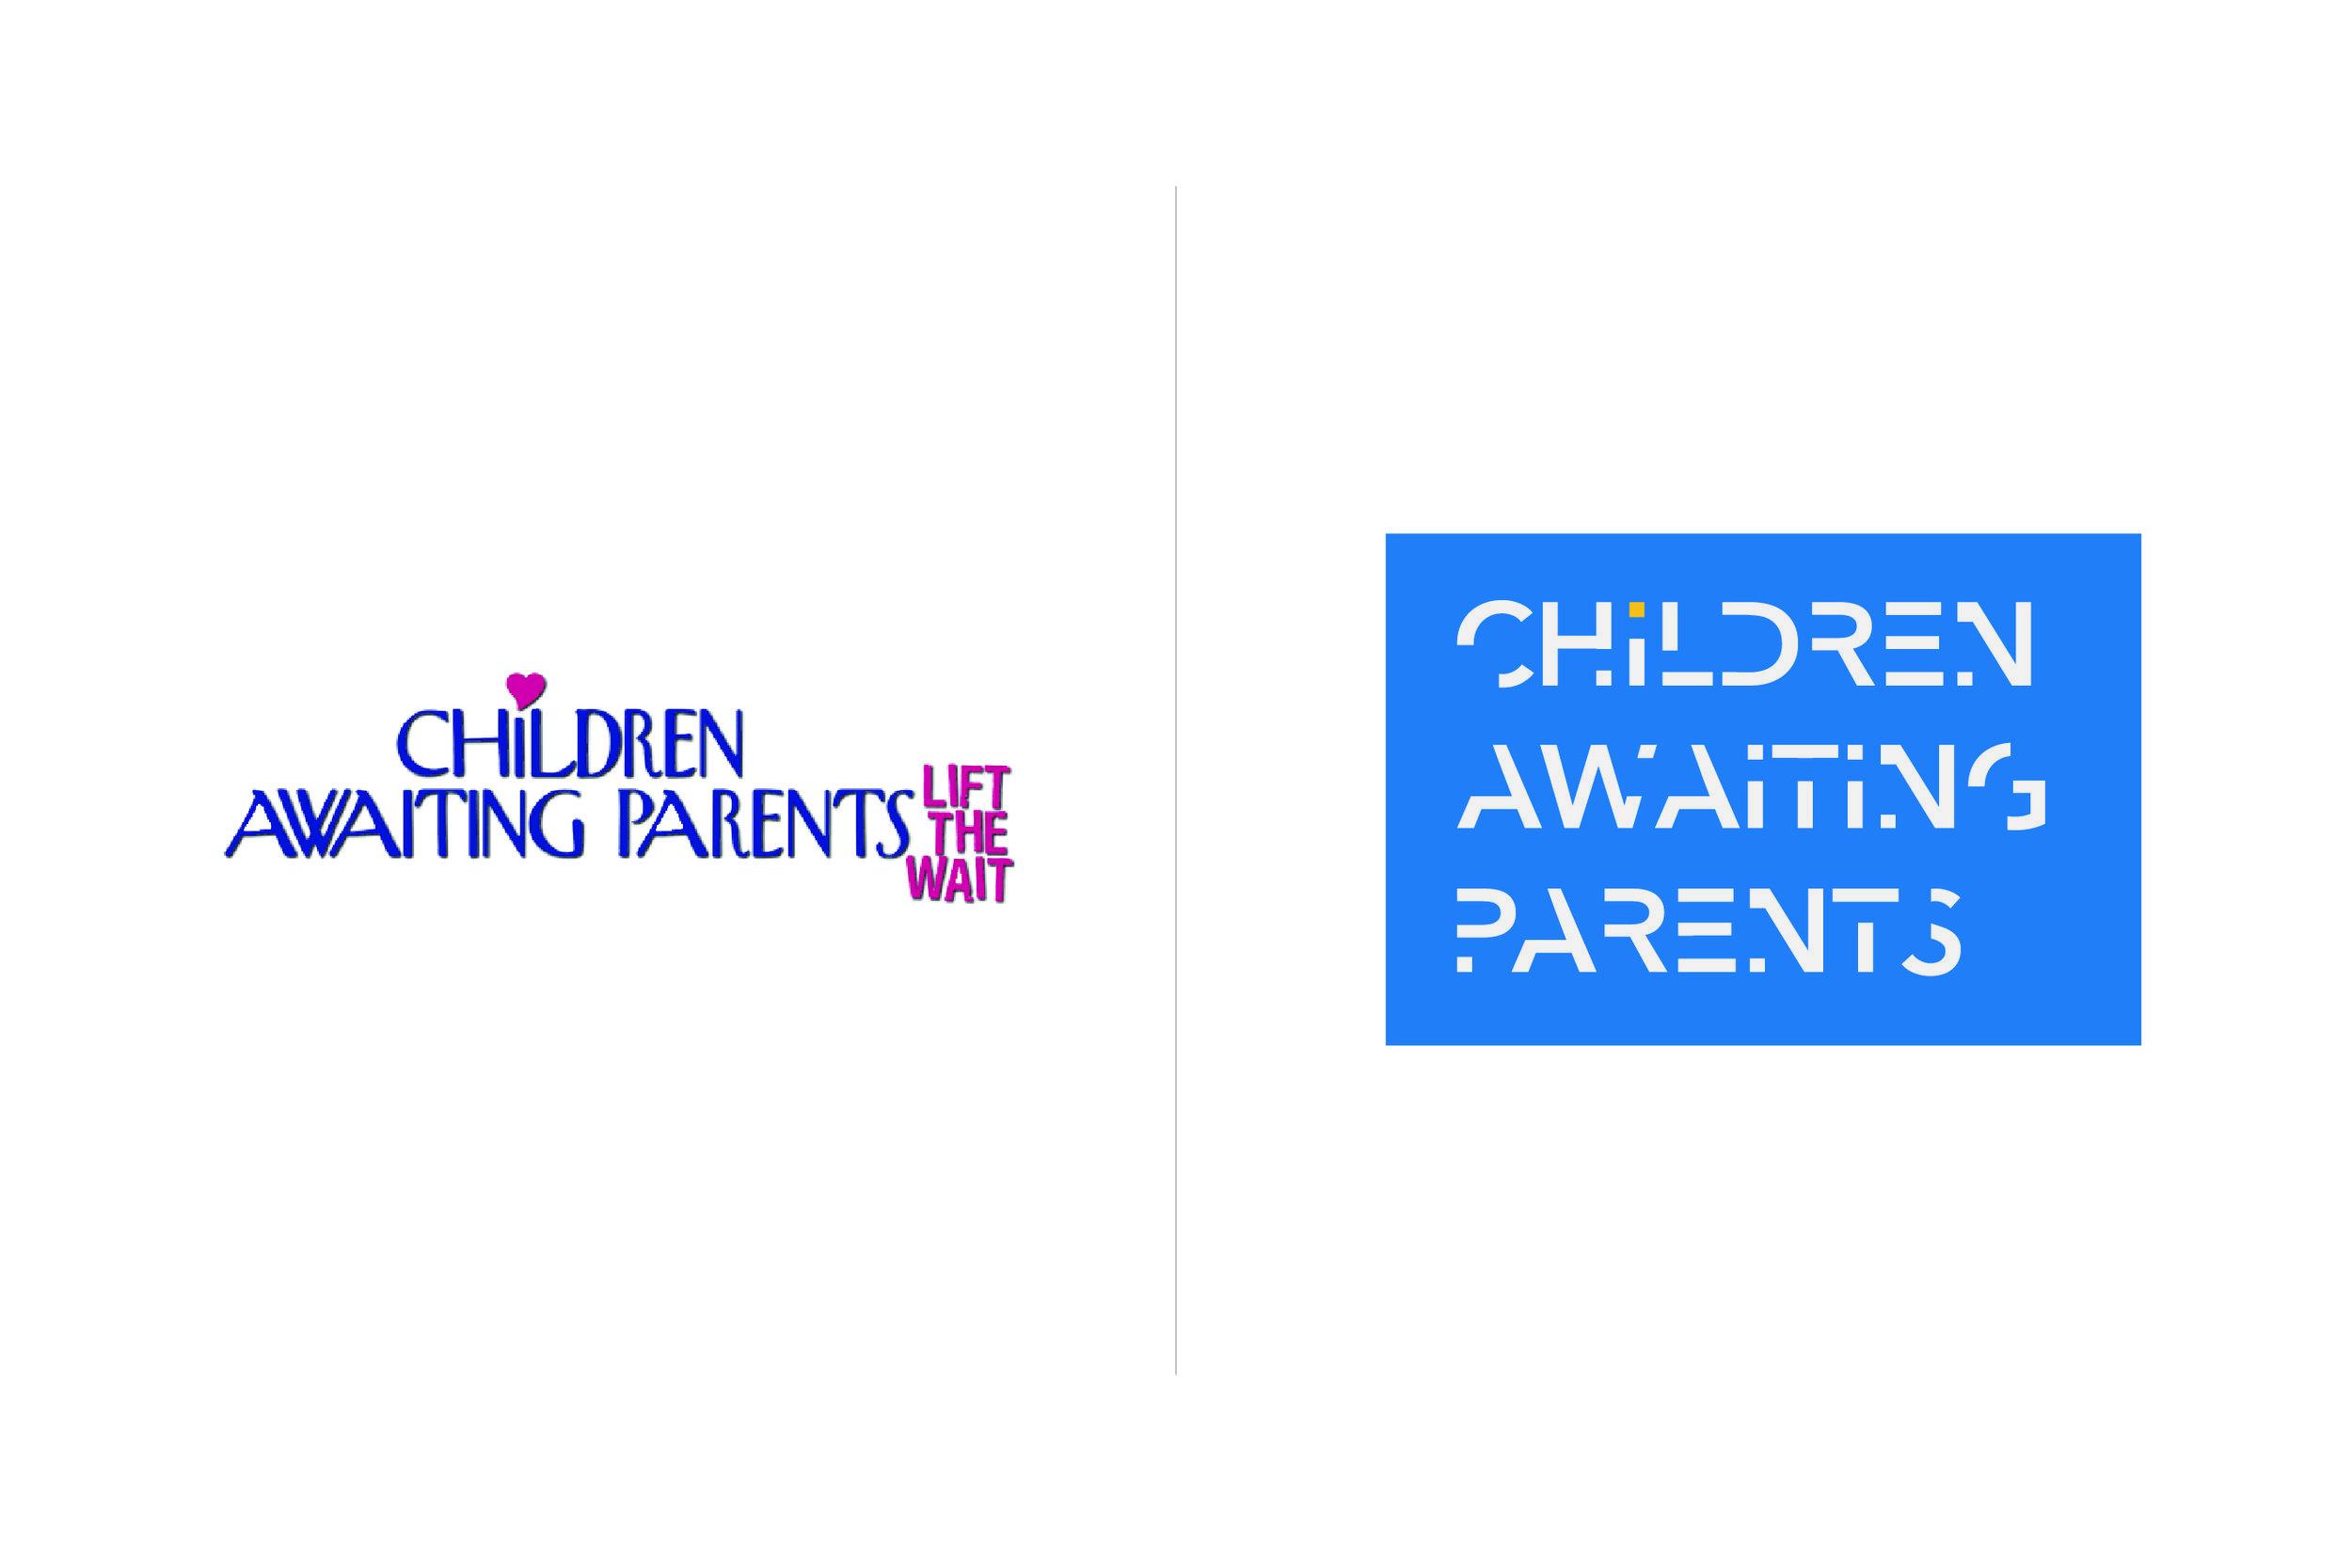 1.1_Jingwei, Yang_Sp19_4121_Children Awaiting Parents Identity Redesign-01.jpg